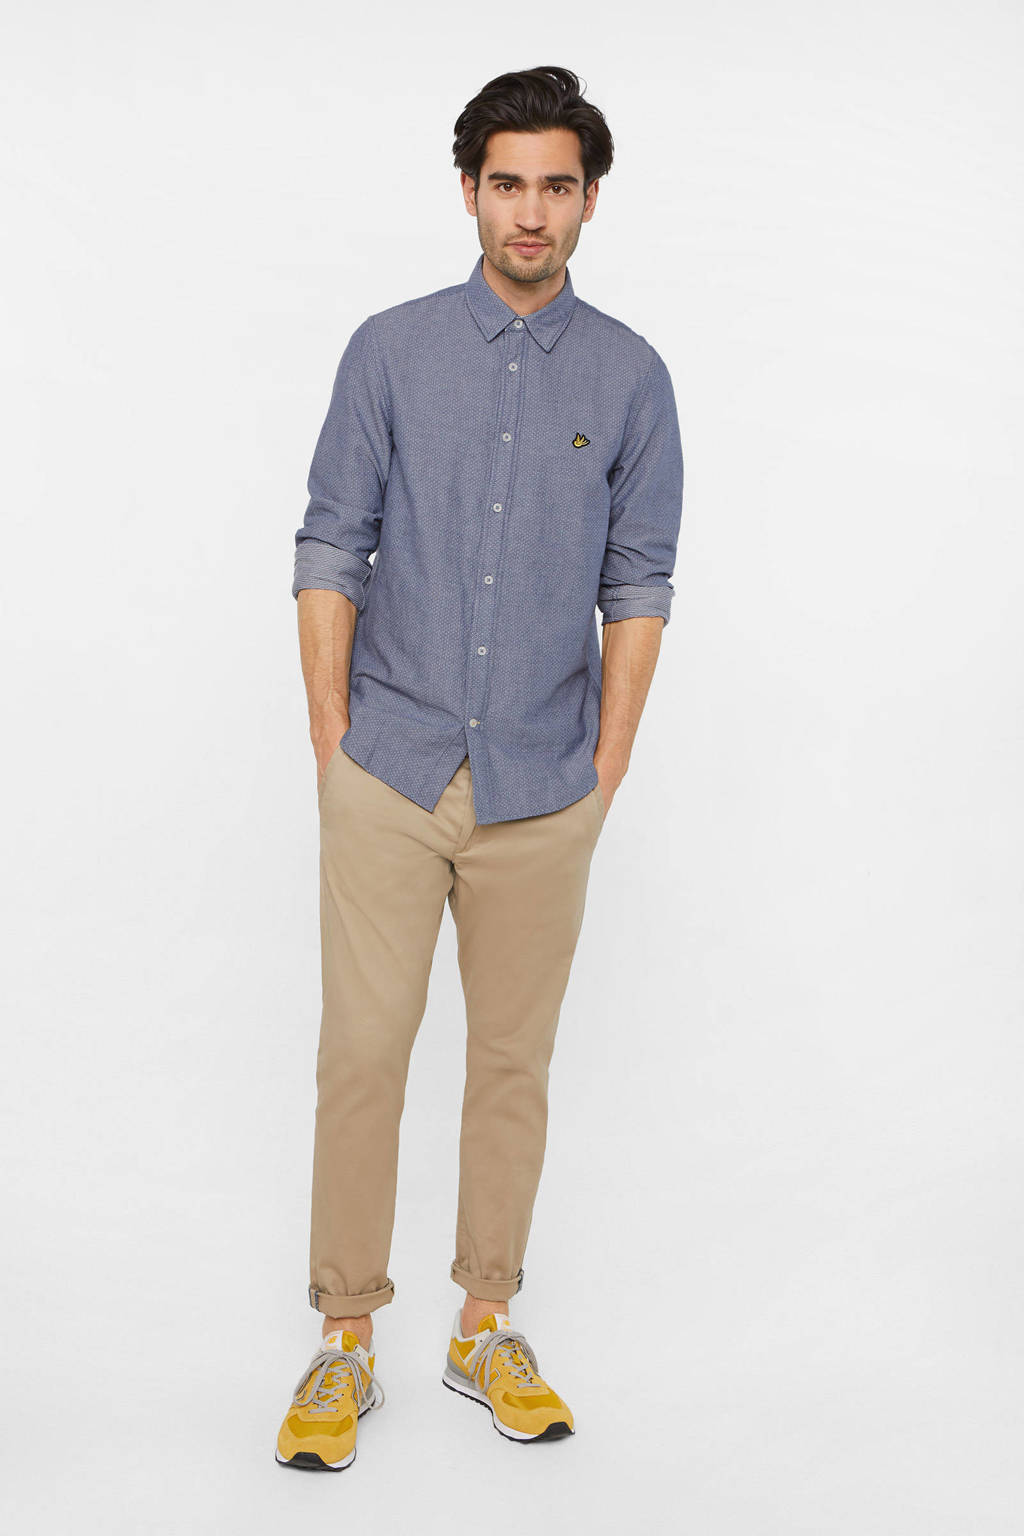 WE Fashion gemêleerd slim fit overhemd blue whale, Blue Whale